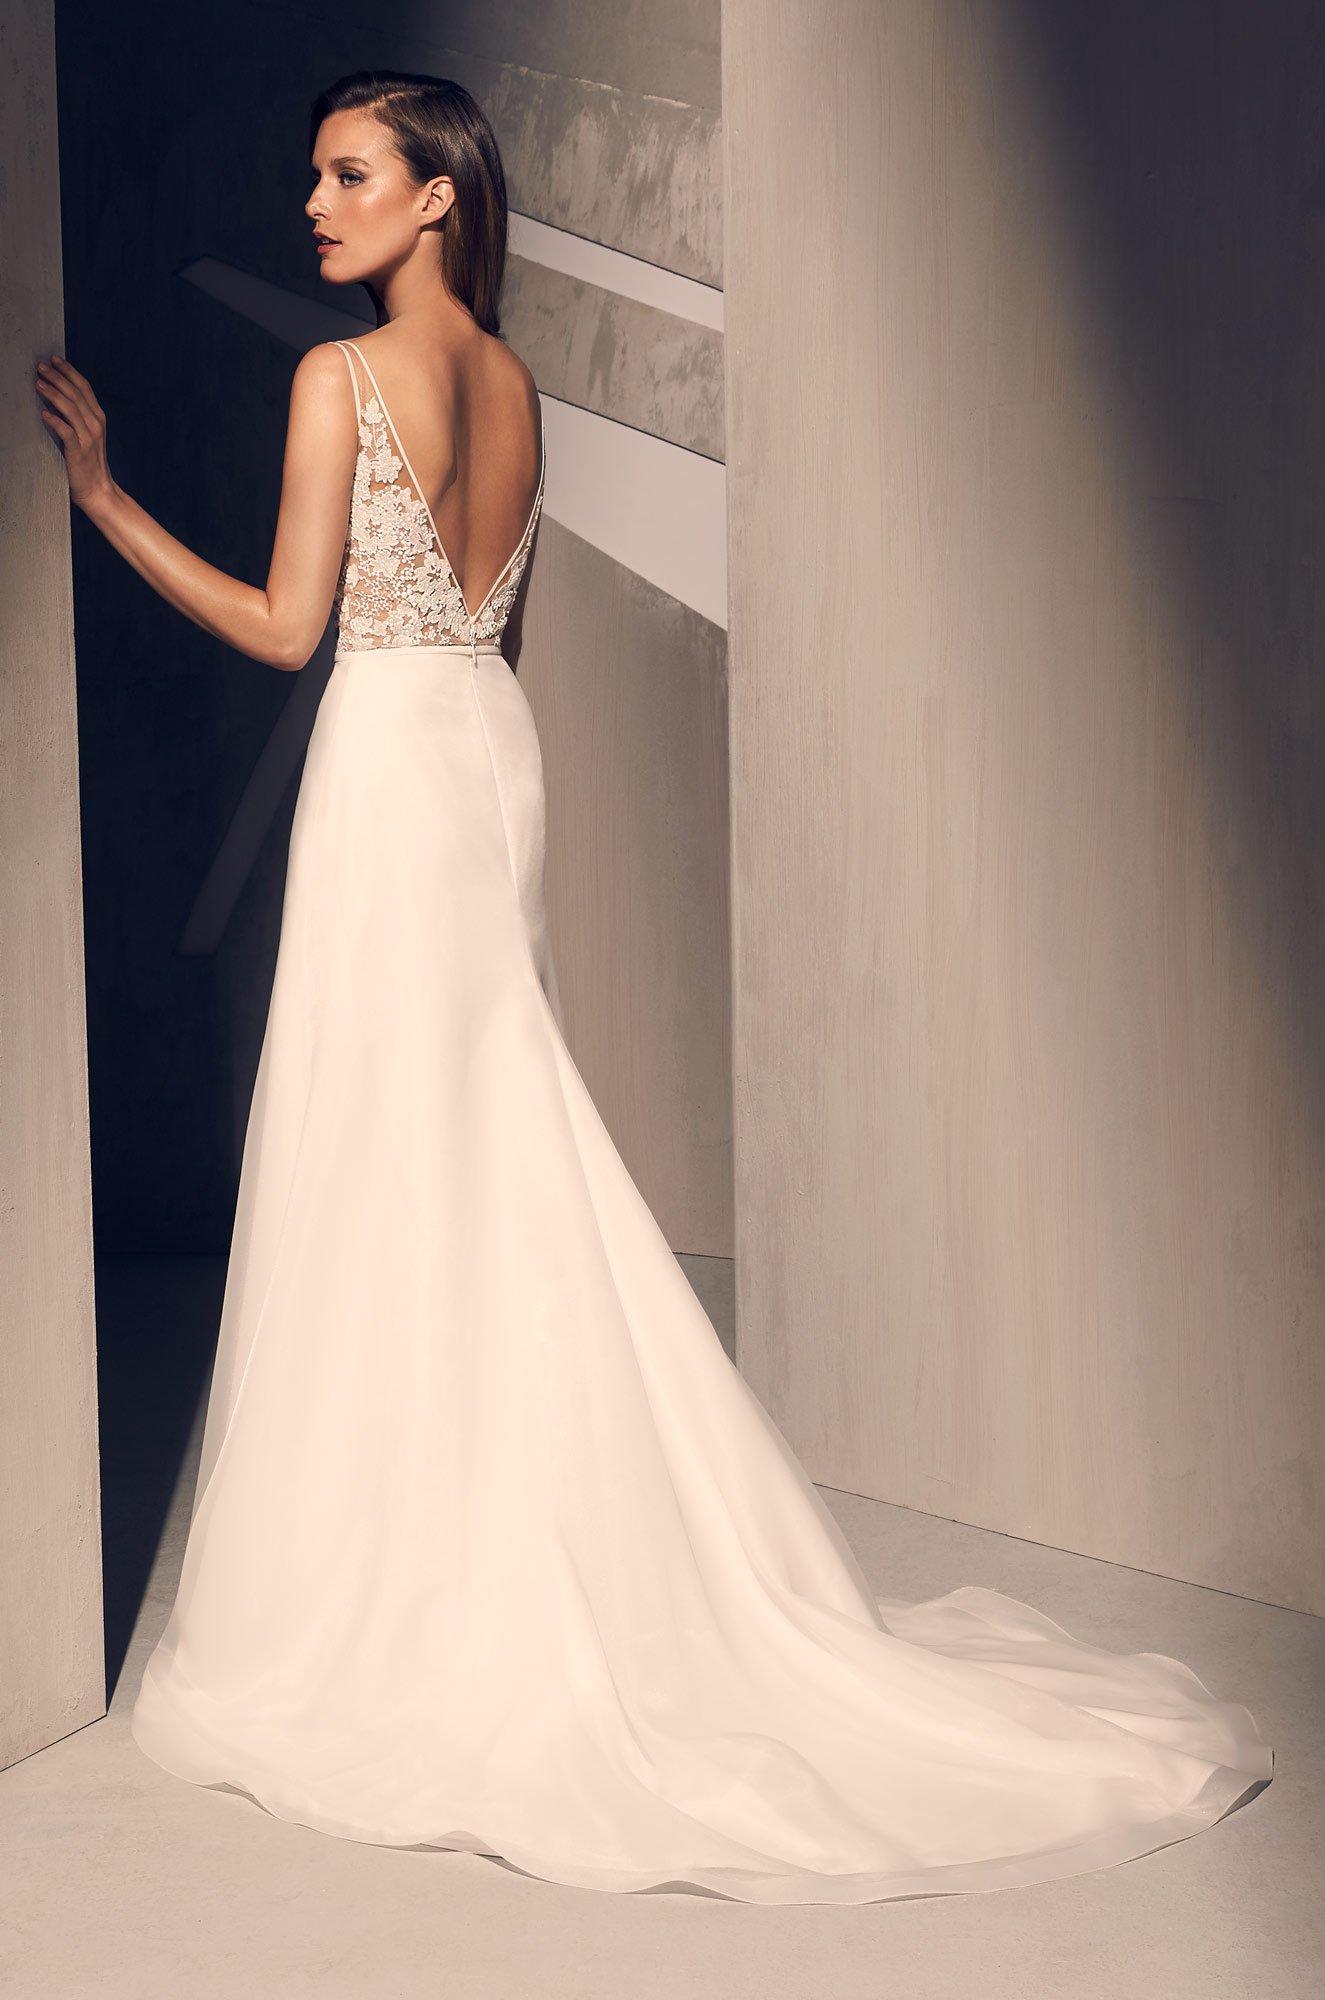 Sheer Sequin Lace Wedding Dress - Style #2210   Mikaella Bridal